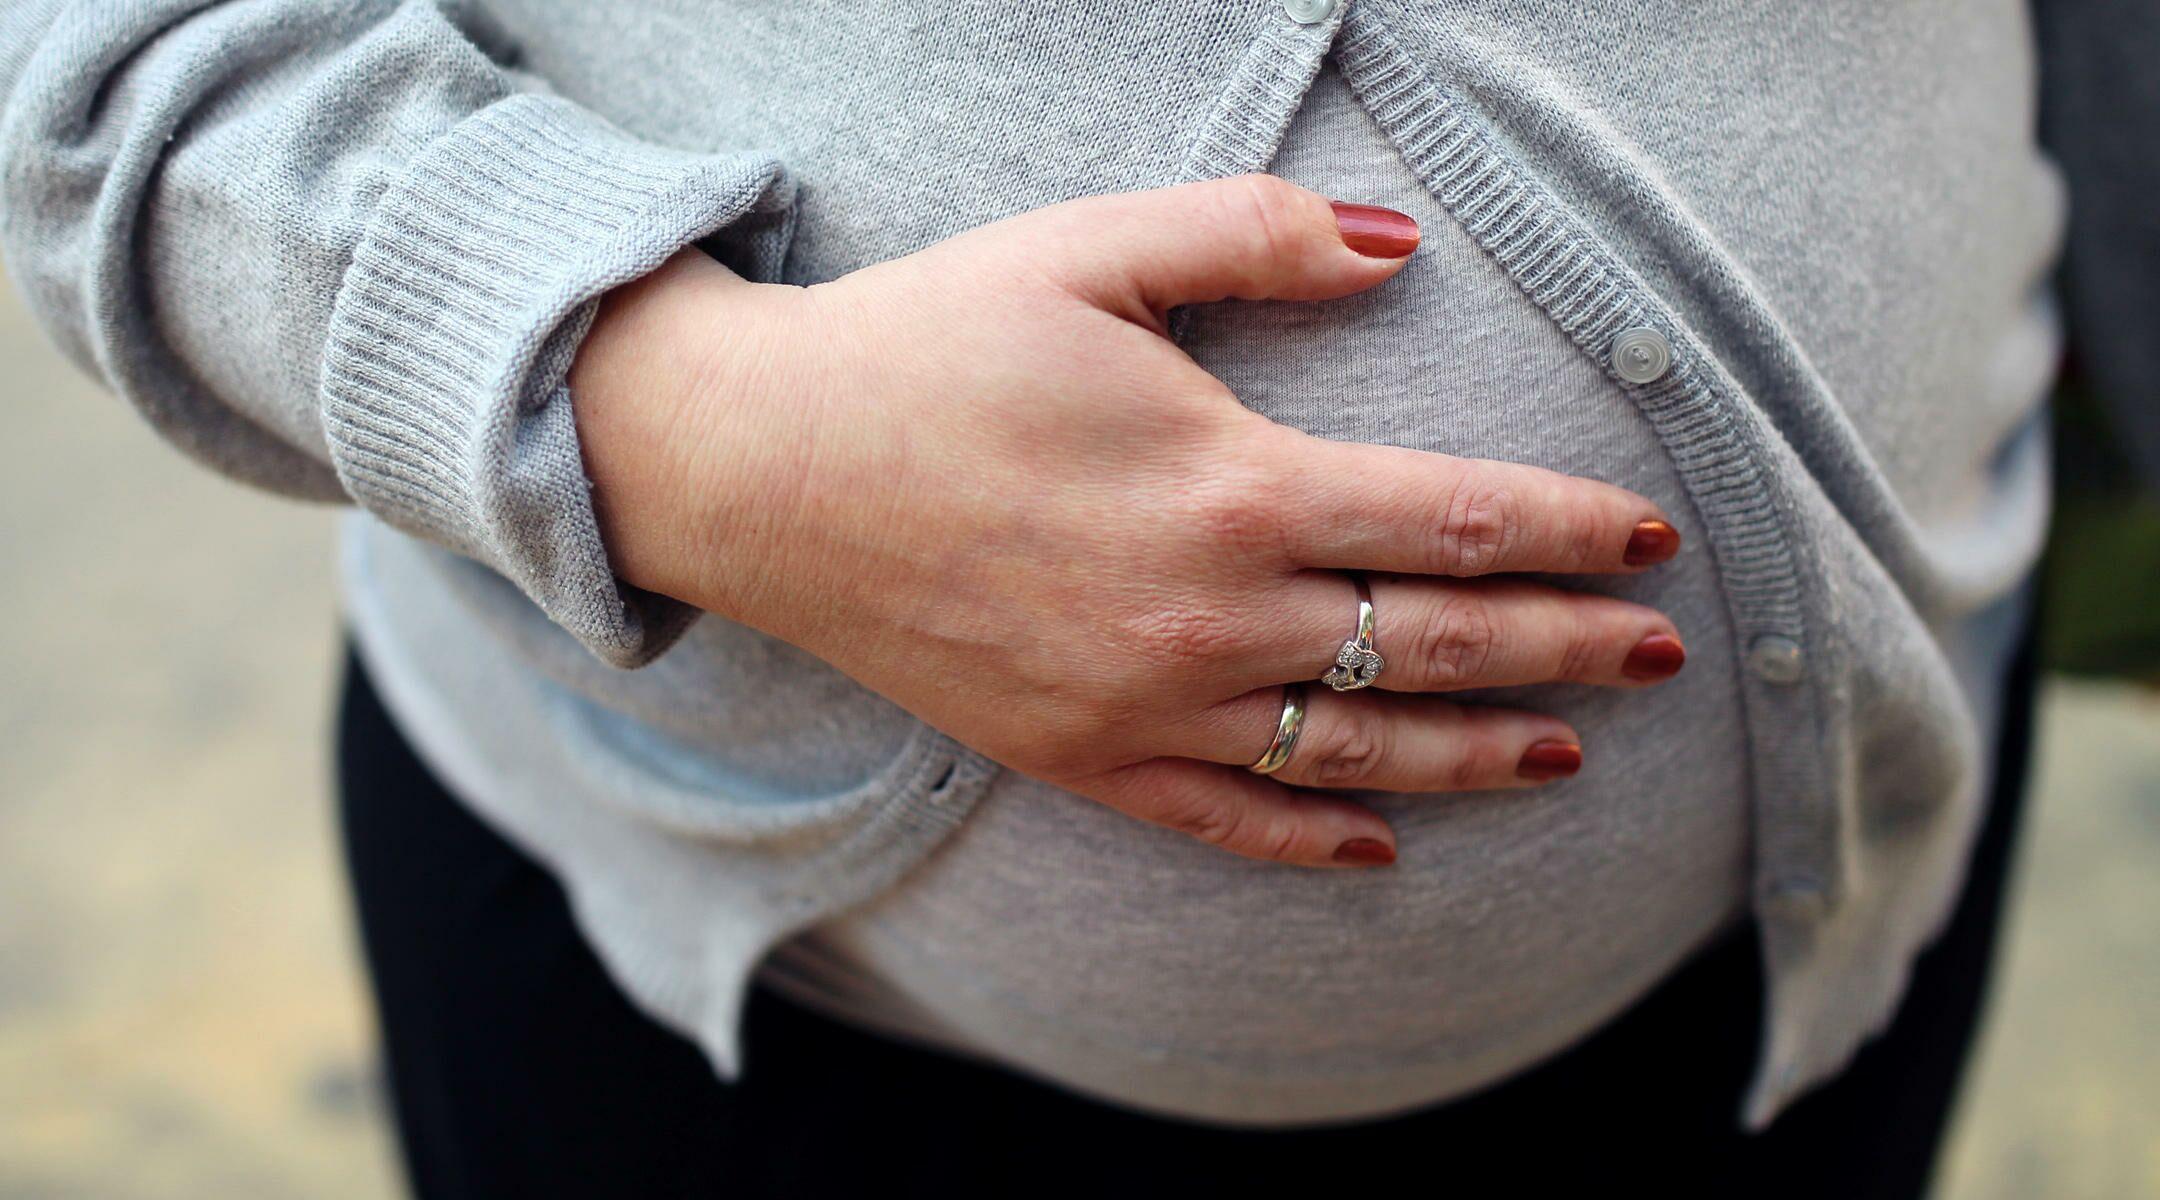 Consider, Vibrator safe pregnancy pity